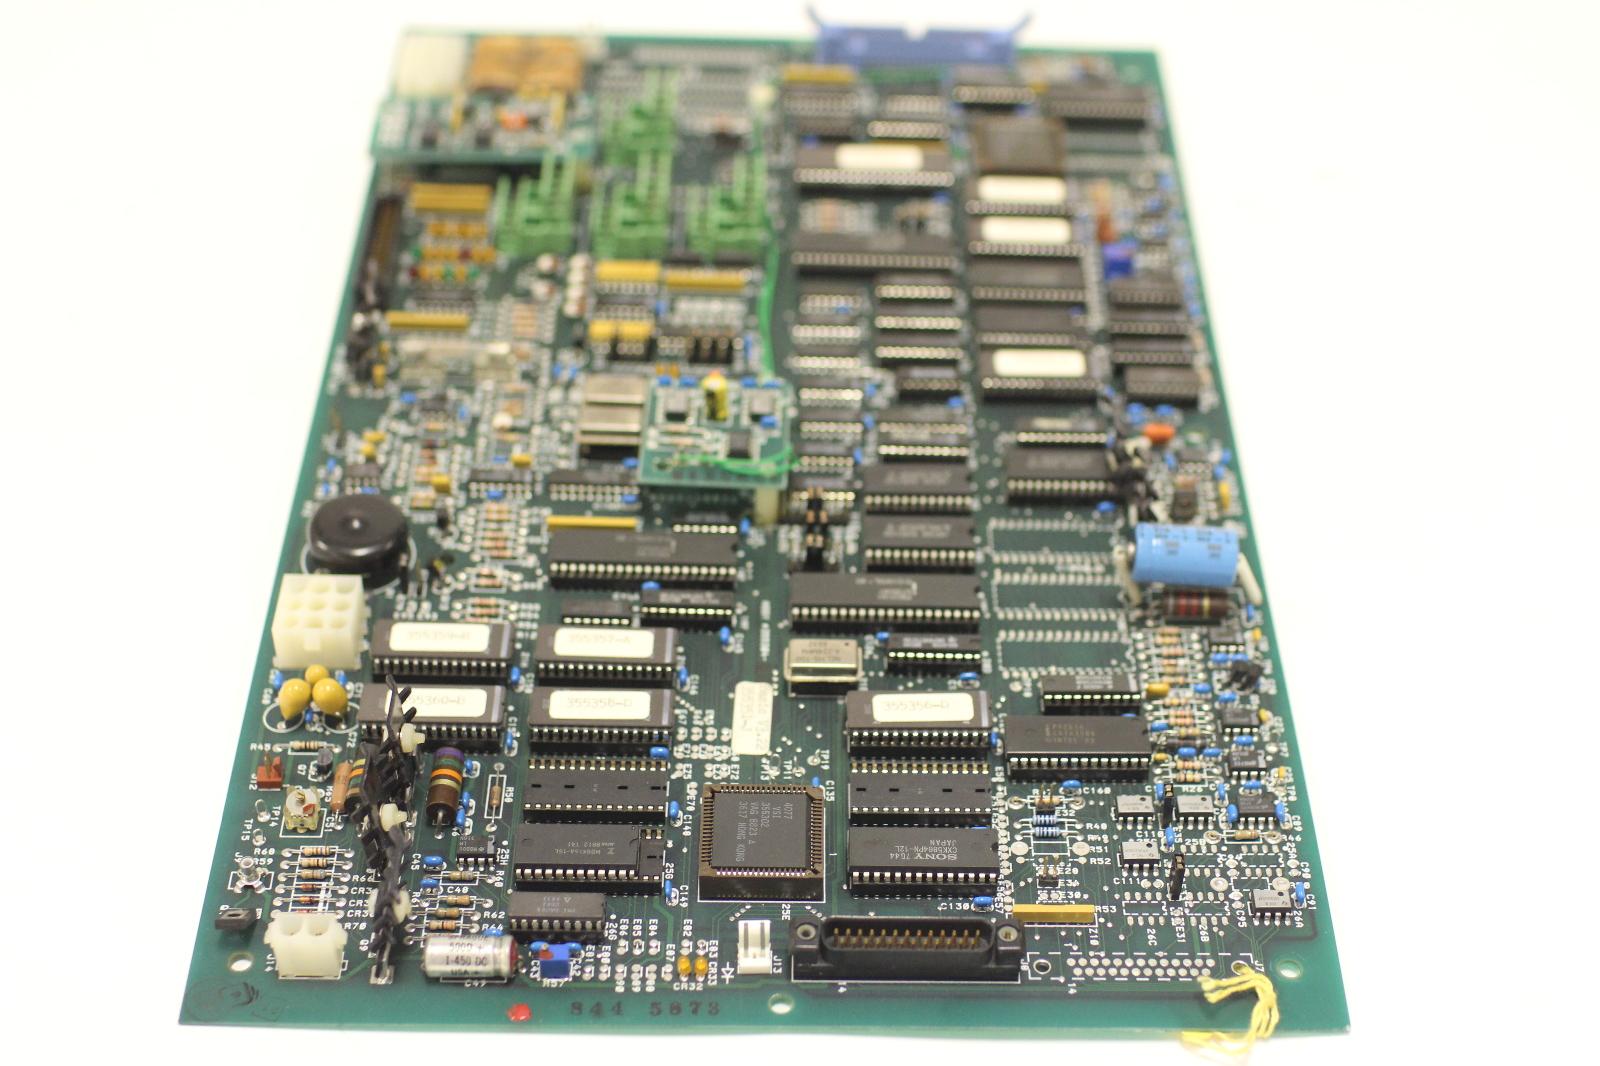 6500 Wiring Diagram Electrolux Get Free Image About Wiring Diagram